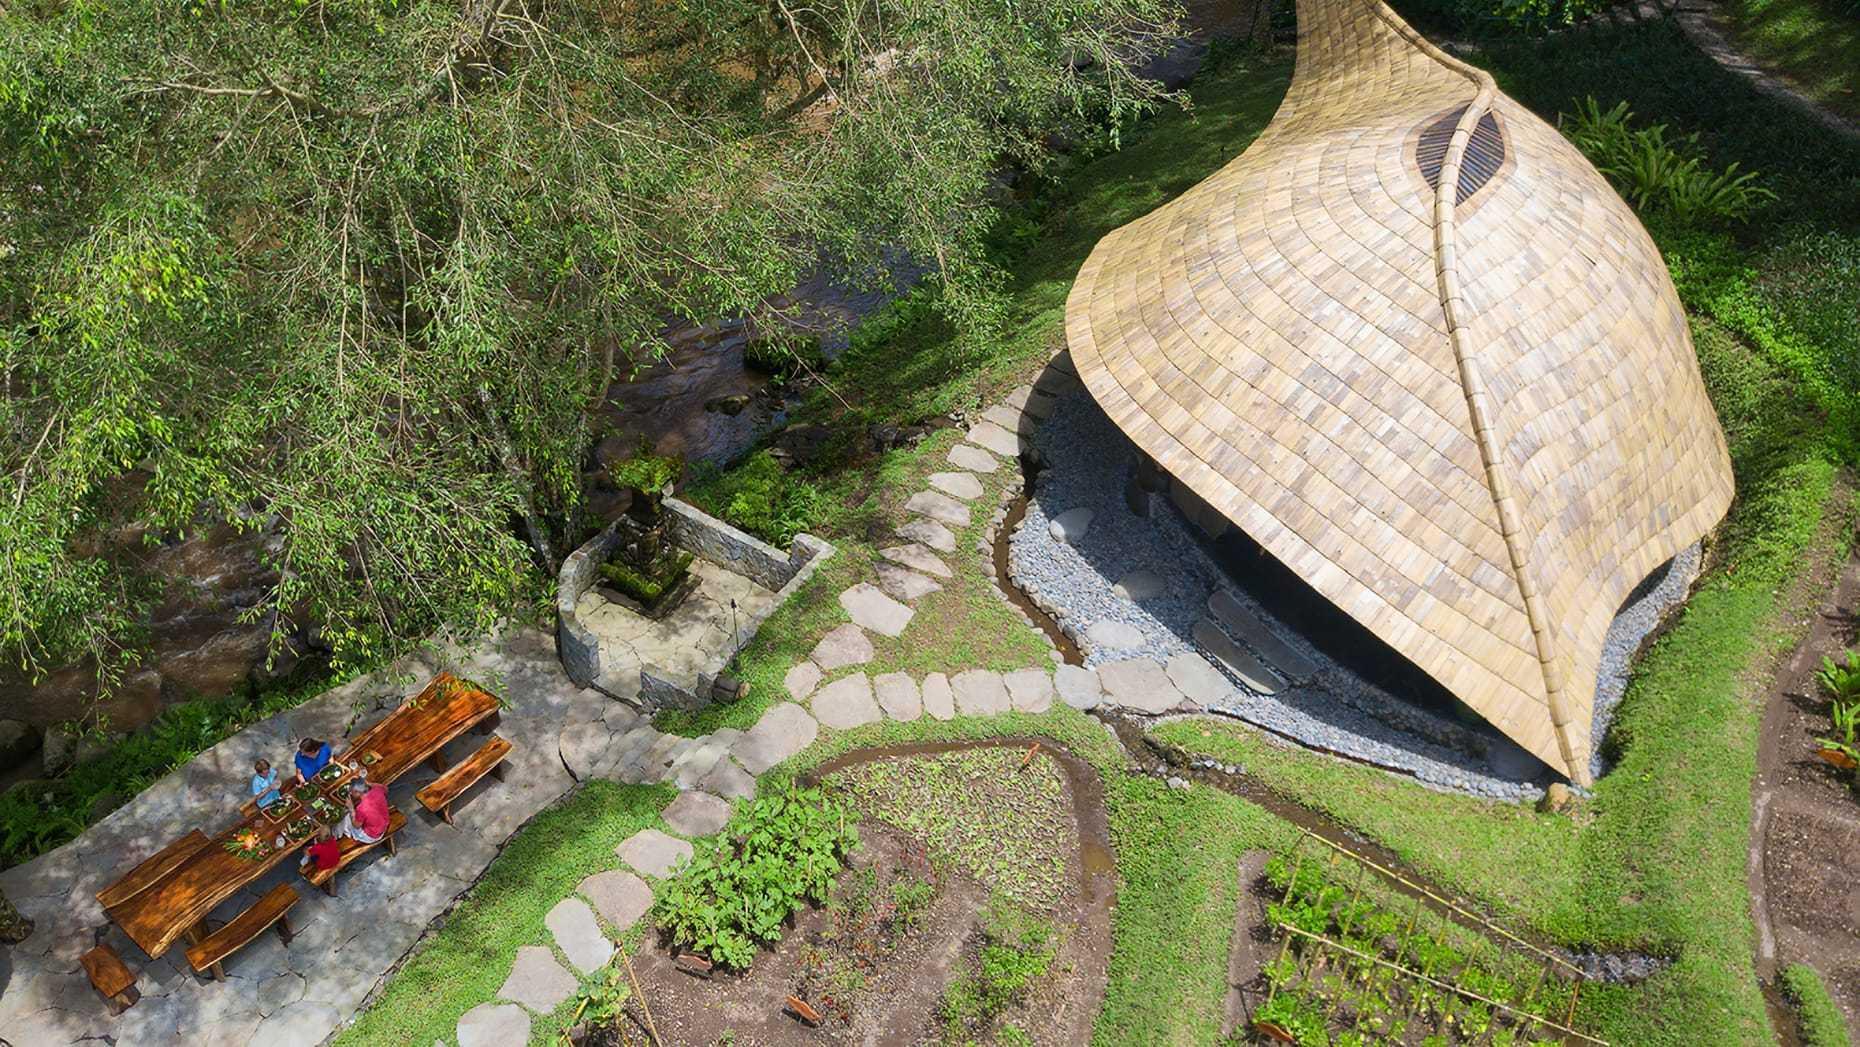 Agung Budi Raharsa   Architecture & Engineering Sokasi Bamboo Cooking Class / School - Bali Bali, Indonesia Bali, Indonesia Elevation   88746